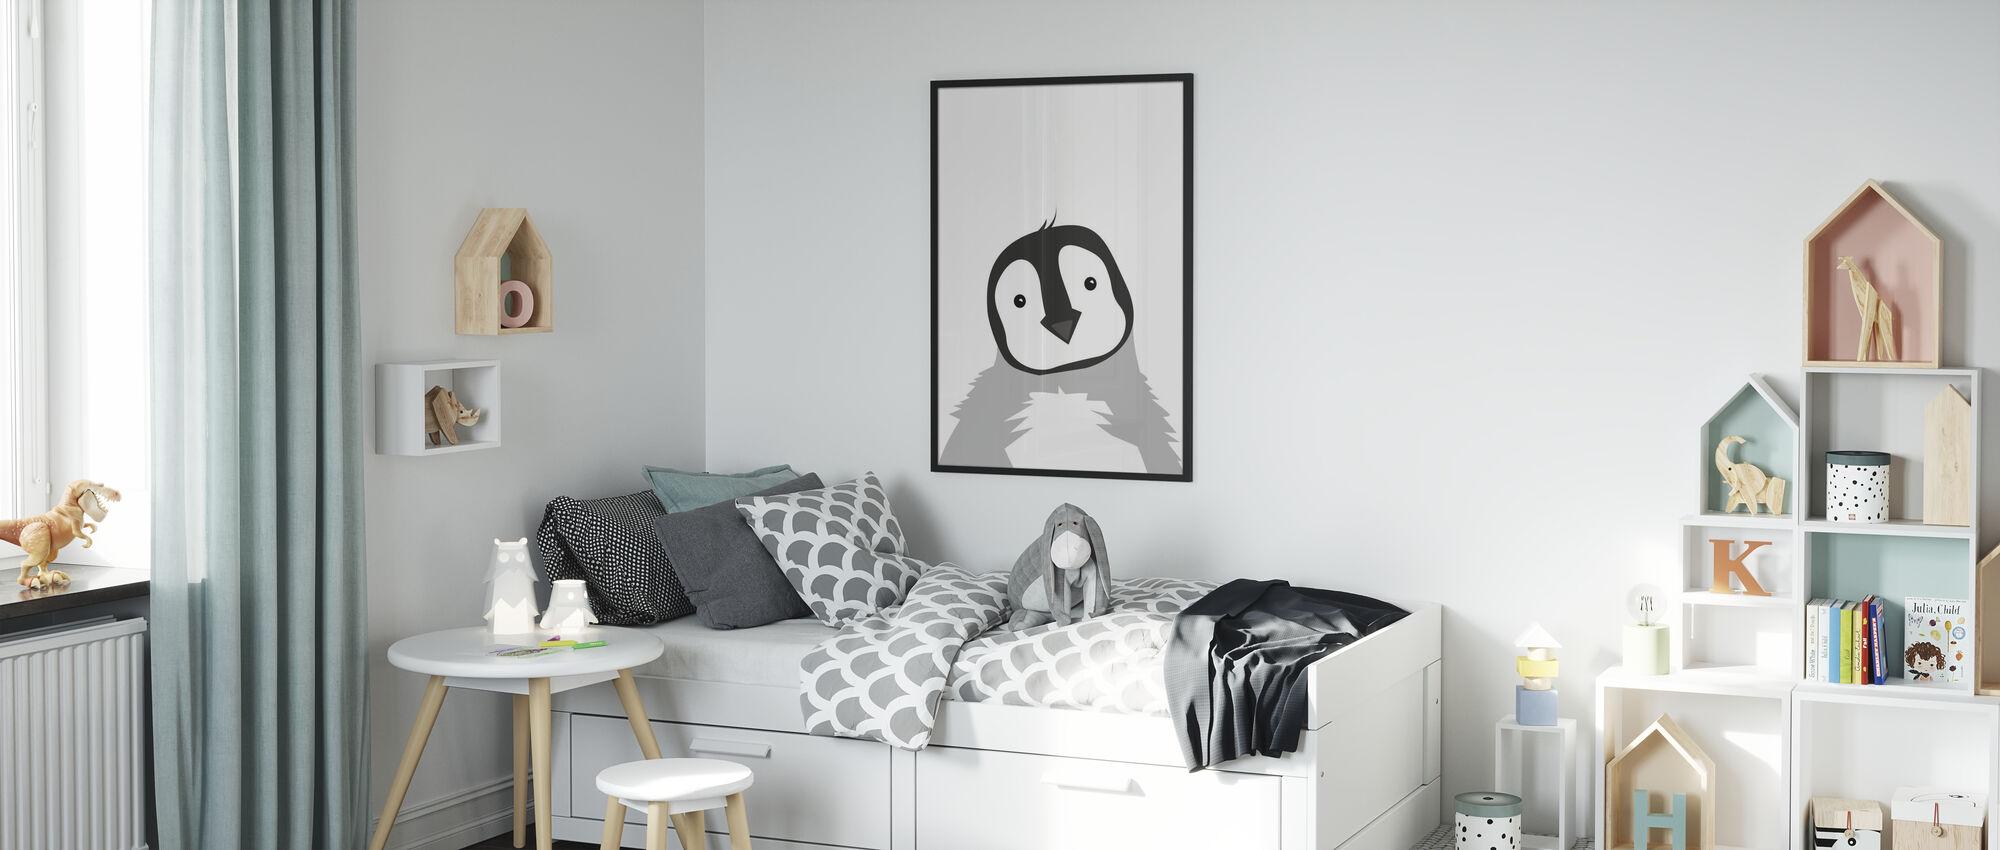 Lubben pingvin - grå - Innrammet bilde - Barnerom